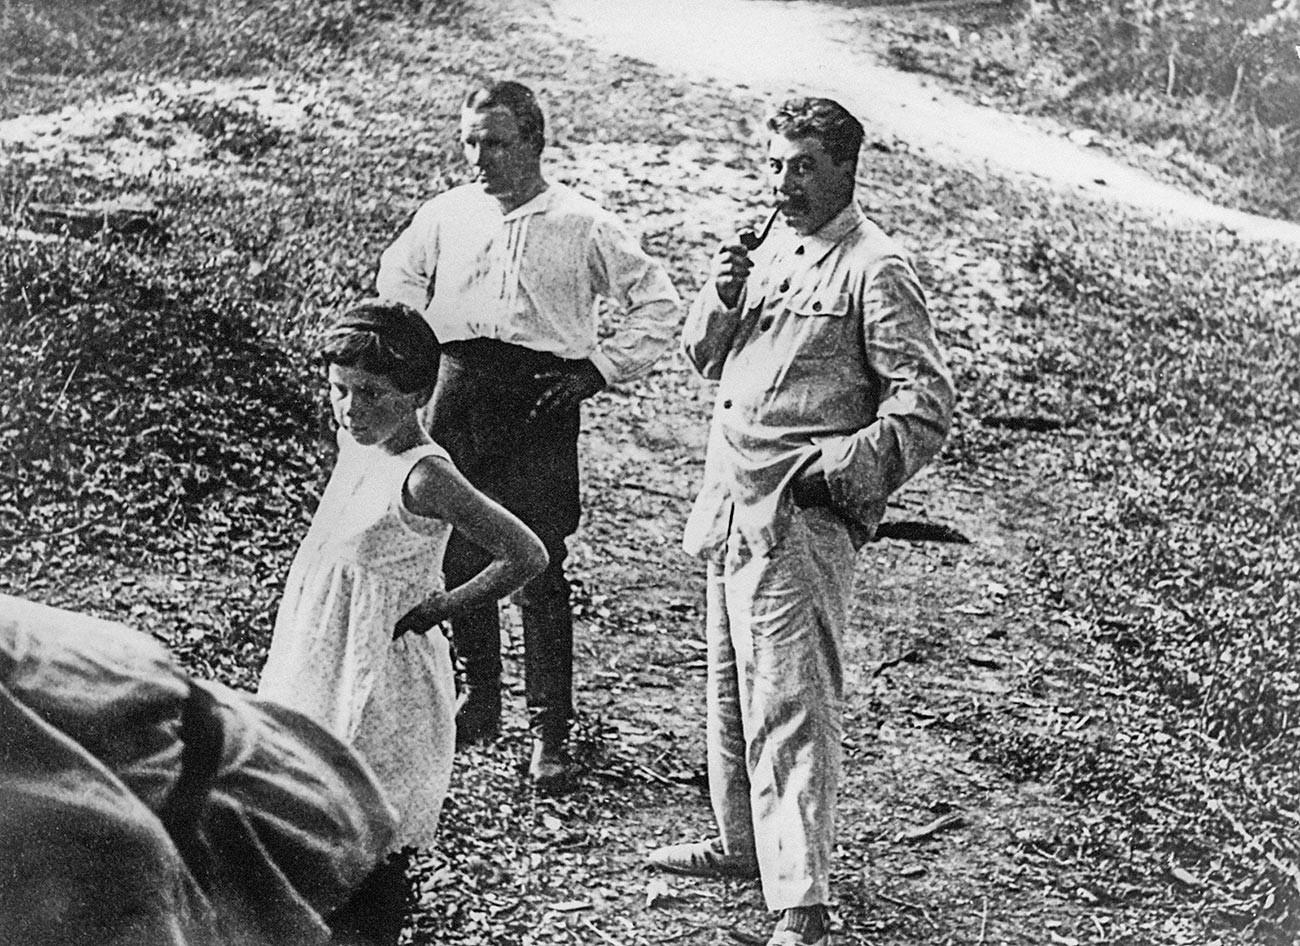 Josef Stalin, Sergei Kirov, dan putri Stalin, Svetlana, tahun 1930-an.